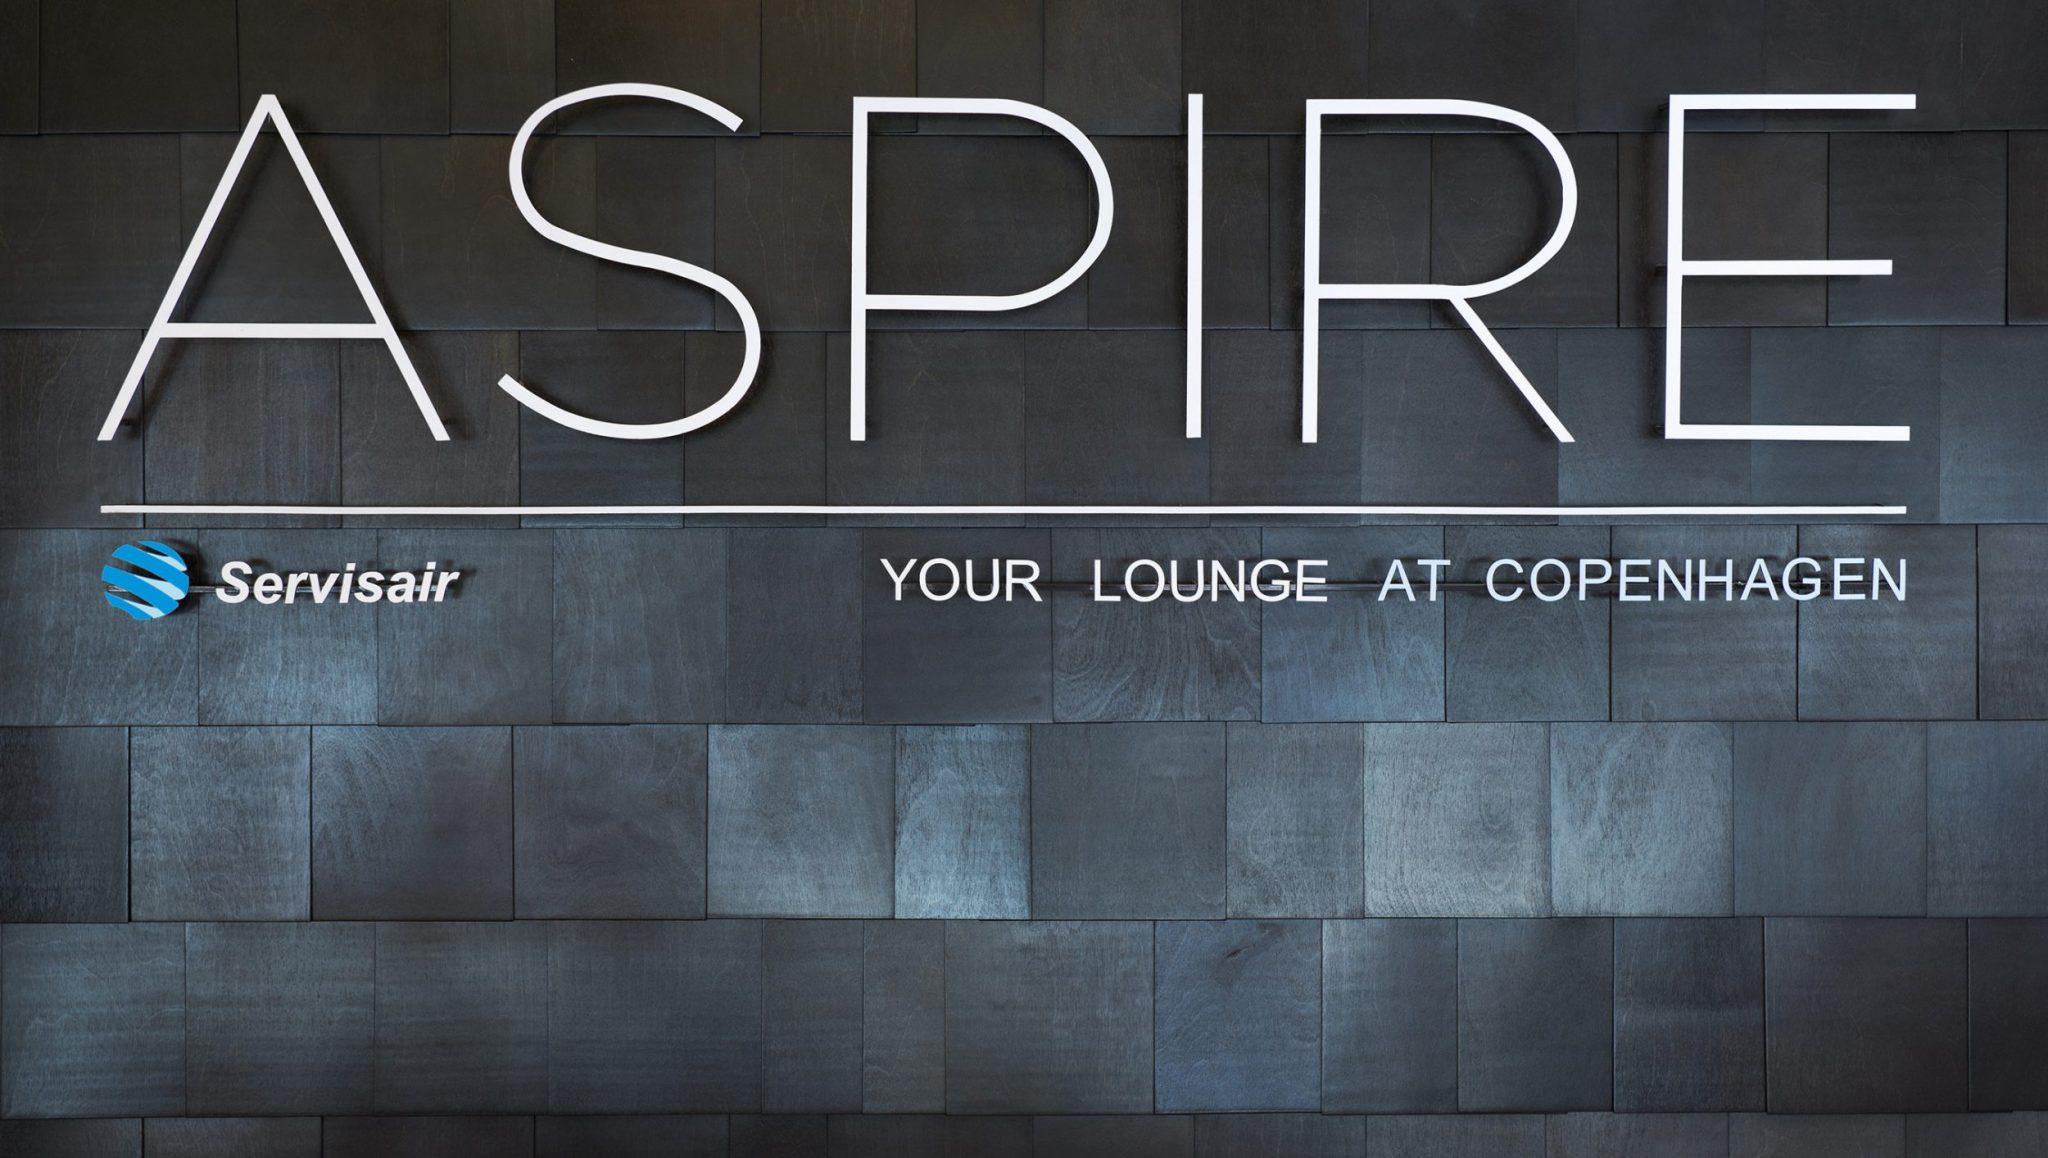 Servisair-Aspire-Airport-Lounge-Copenhagen-Denmark-GI-Project-2